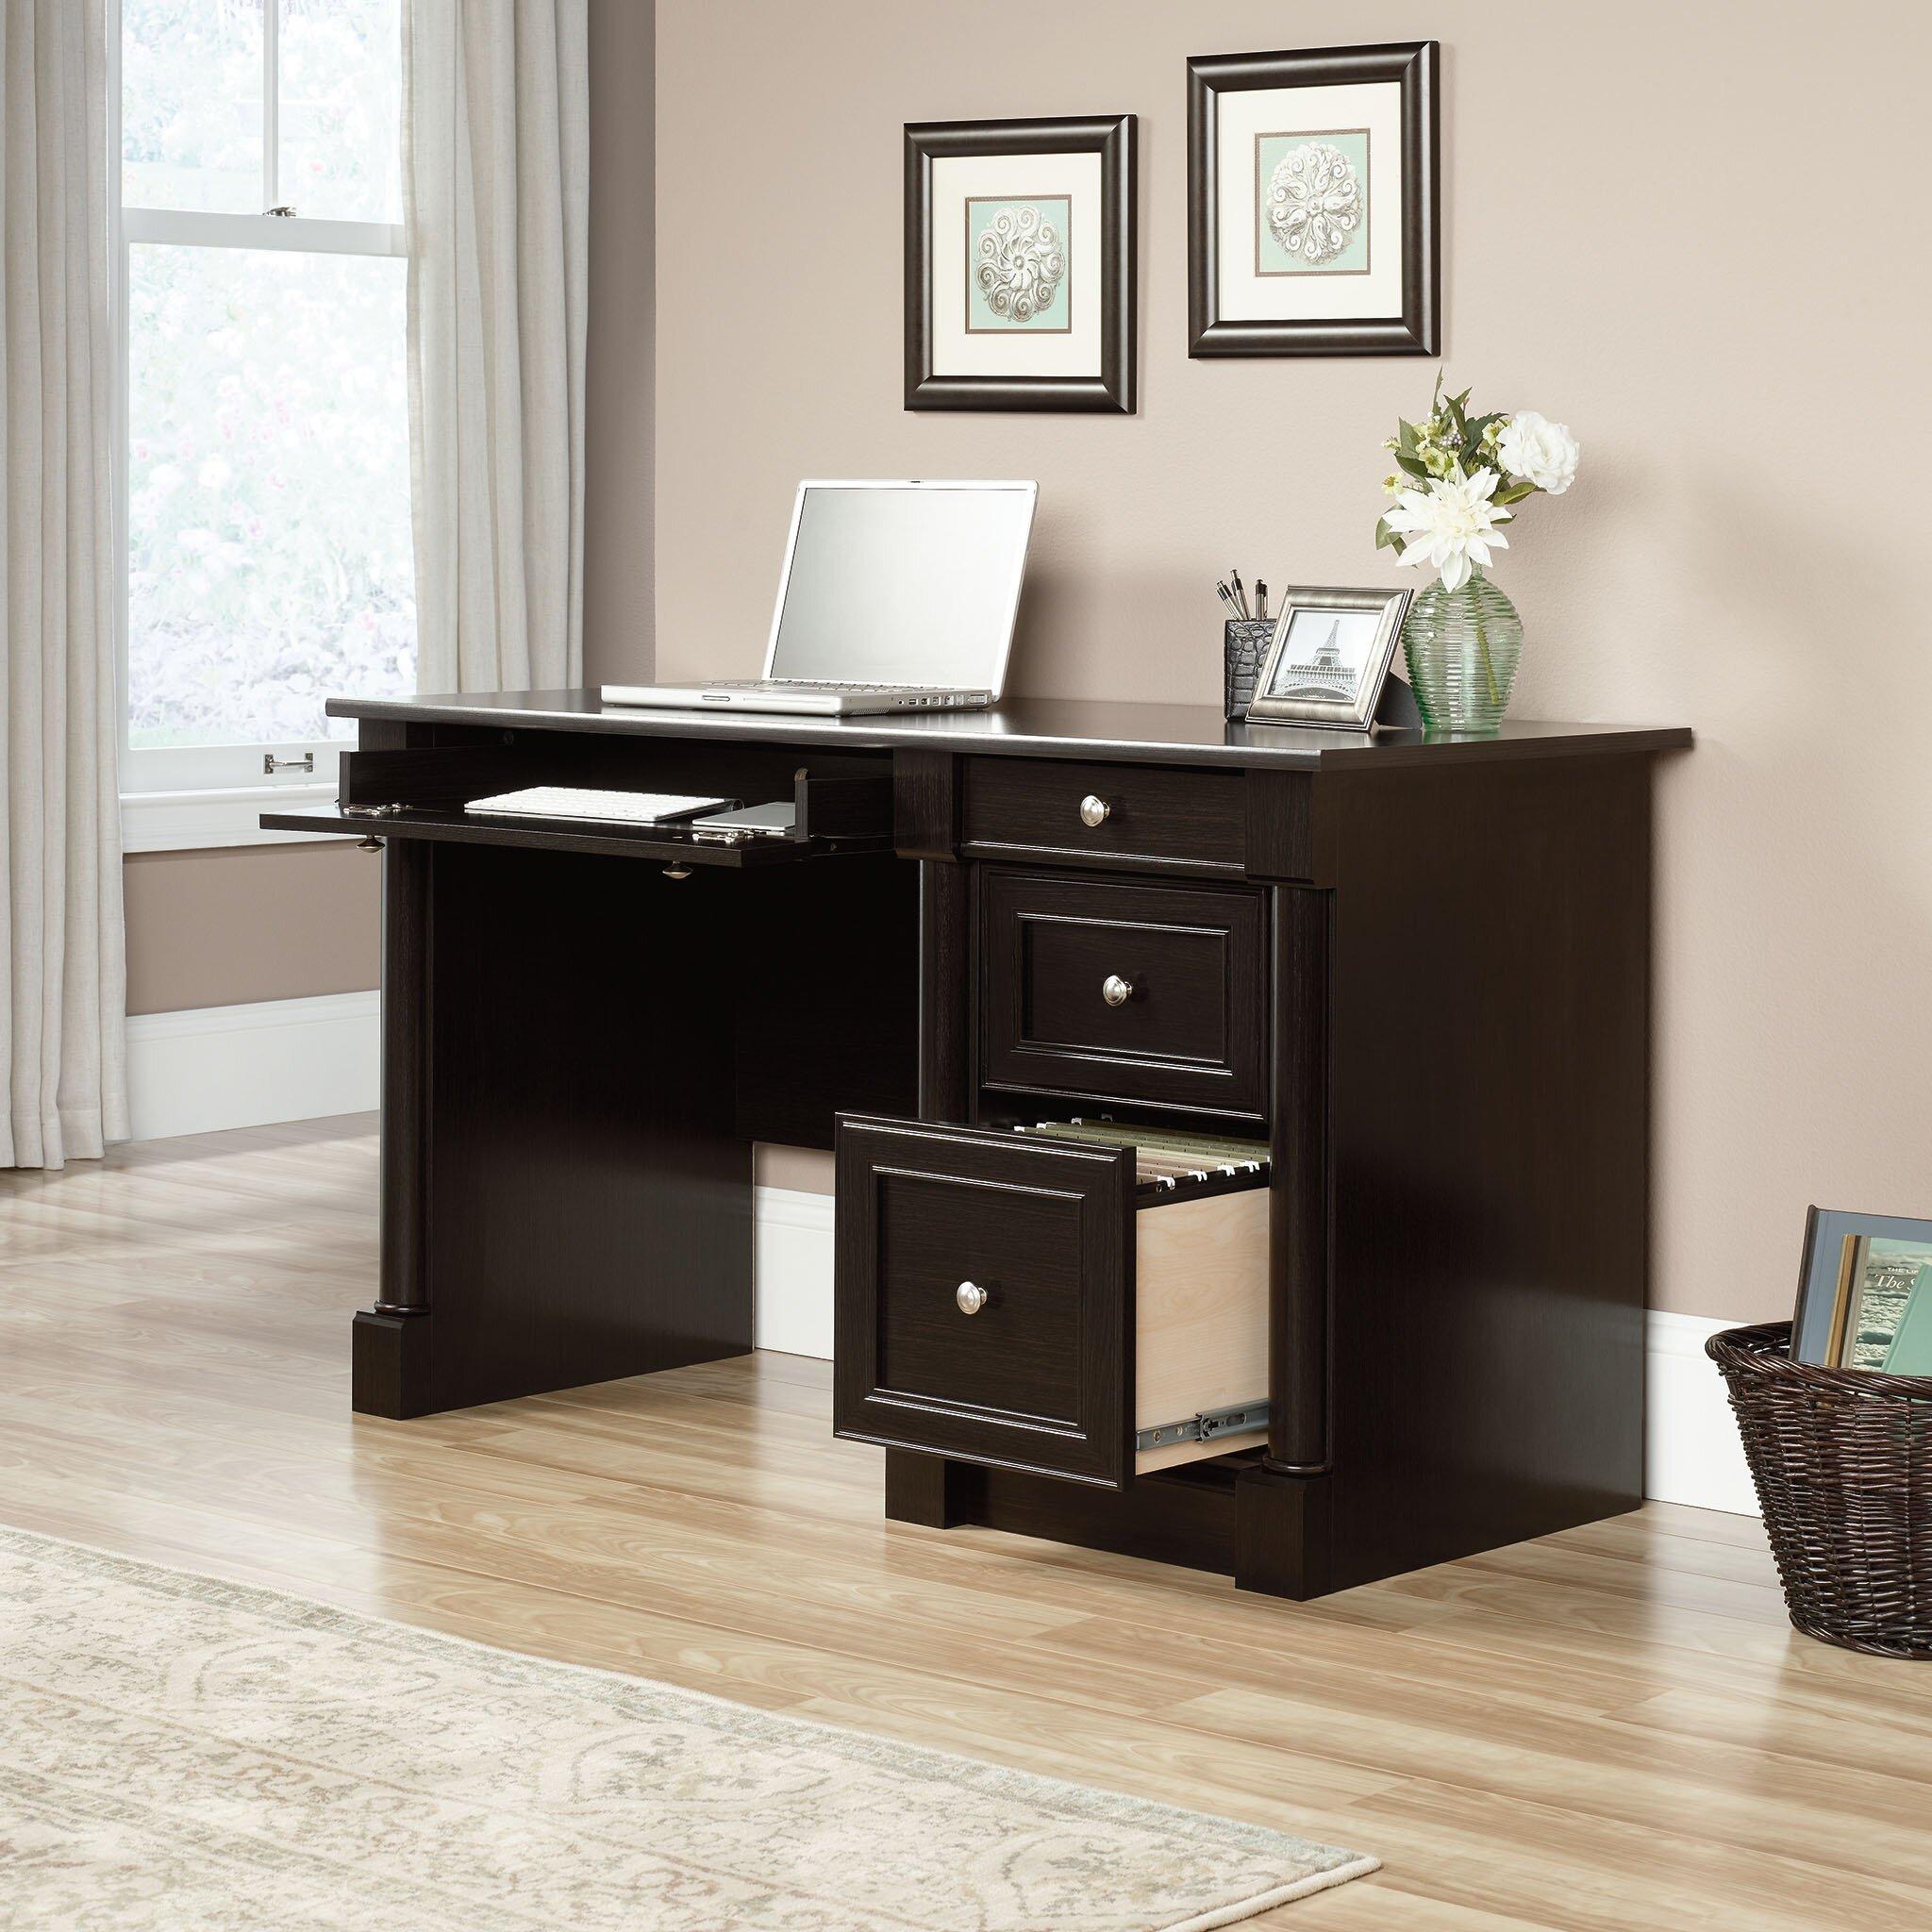 darby home co hennepin 4 drawer computer desk reviews wayfair. Black Bedroom Furniture Sets. Home Design Ideas